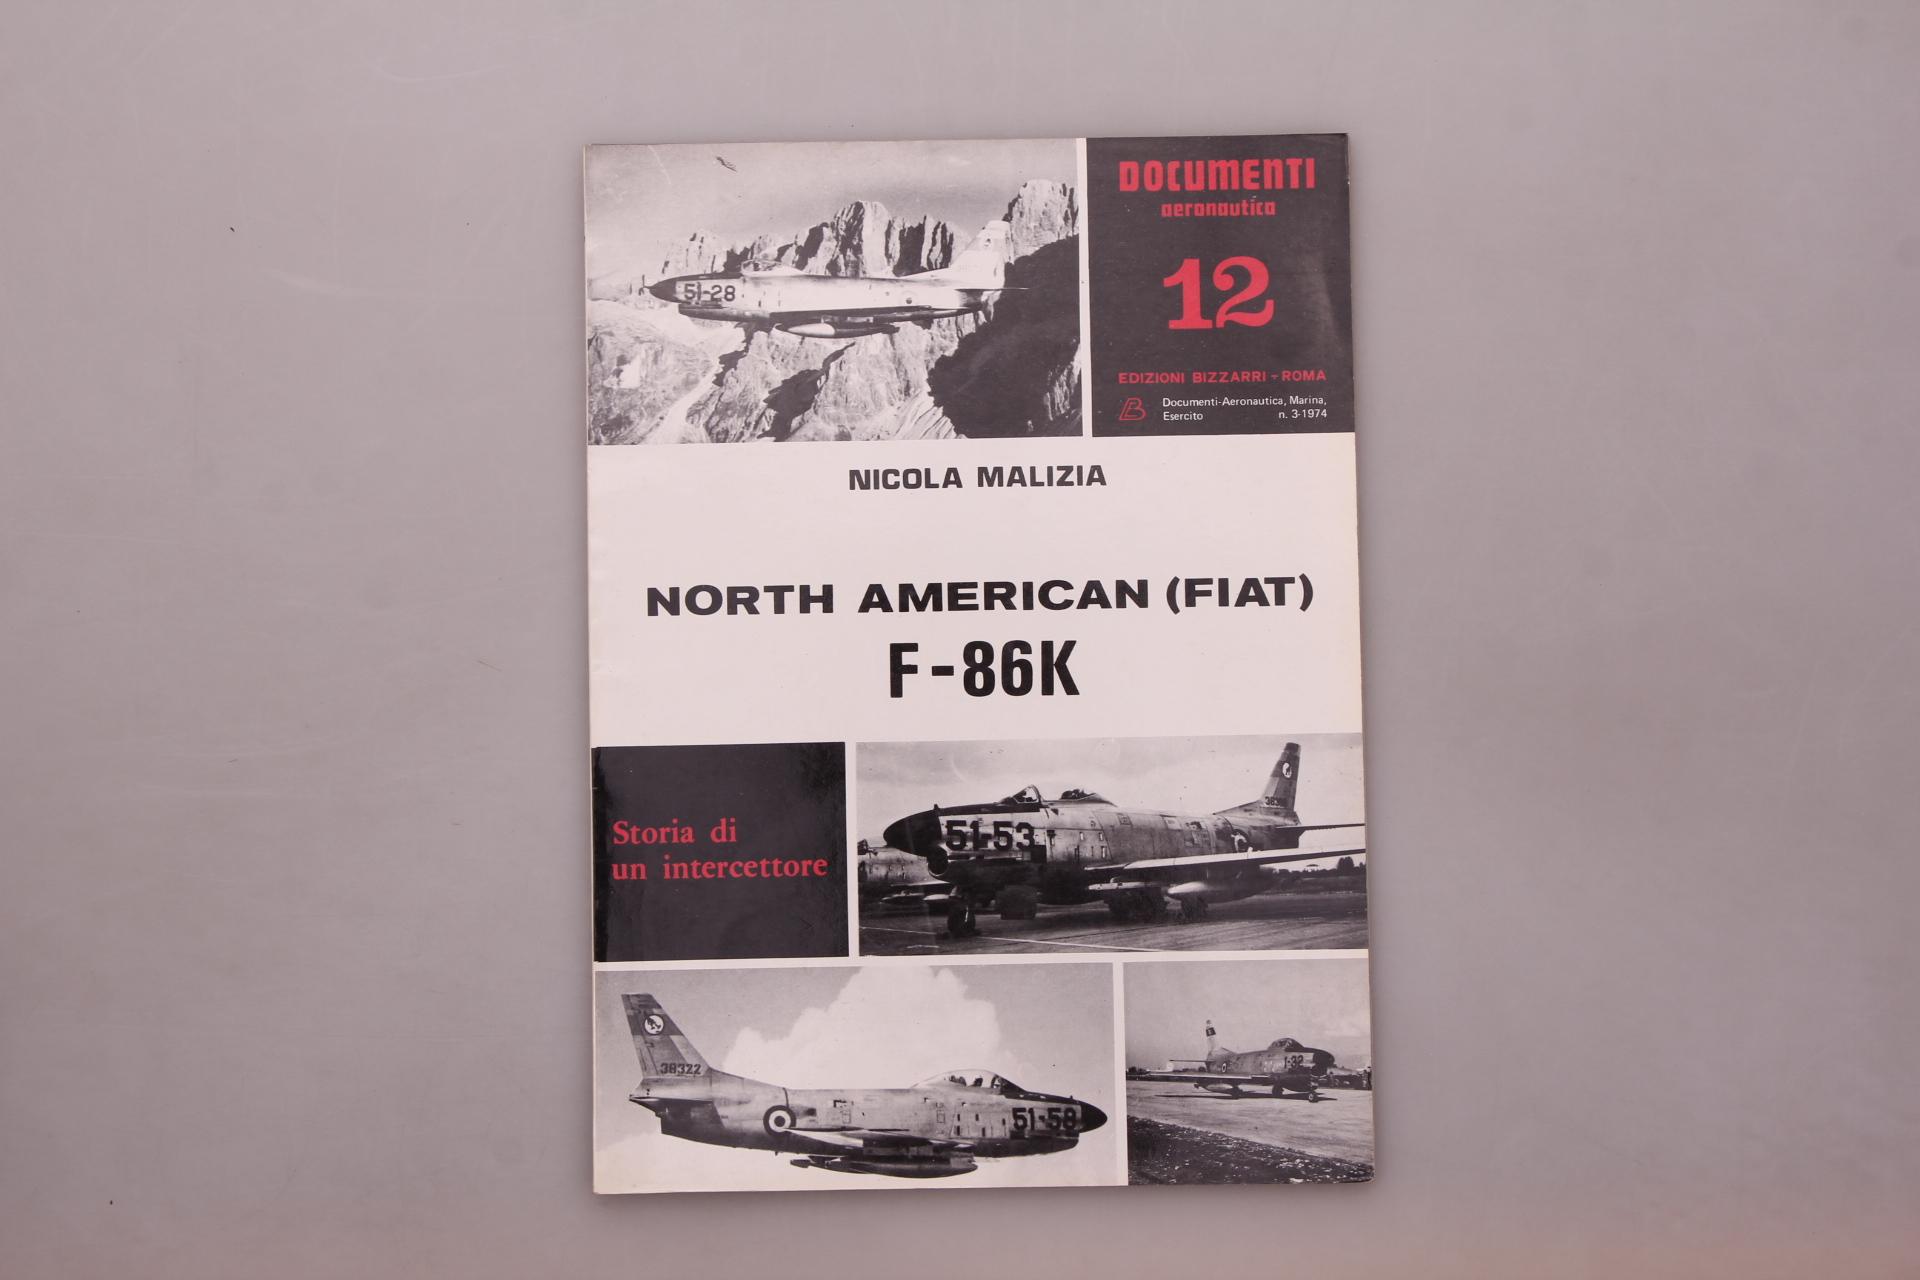 NORTH AMERICAN FIAT F-86K